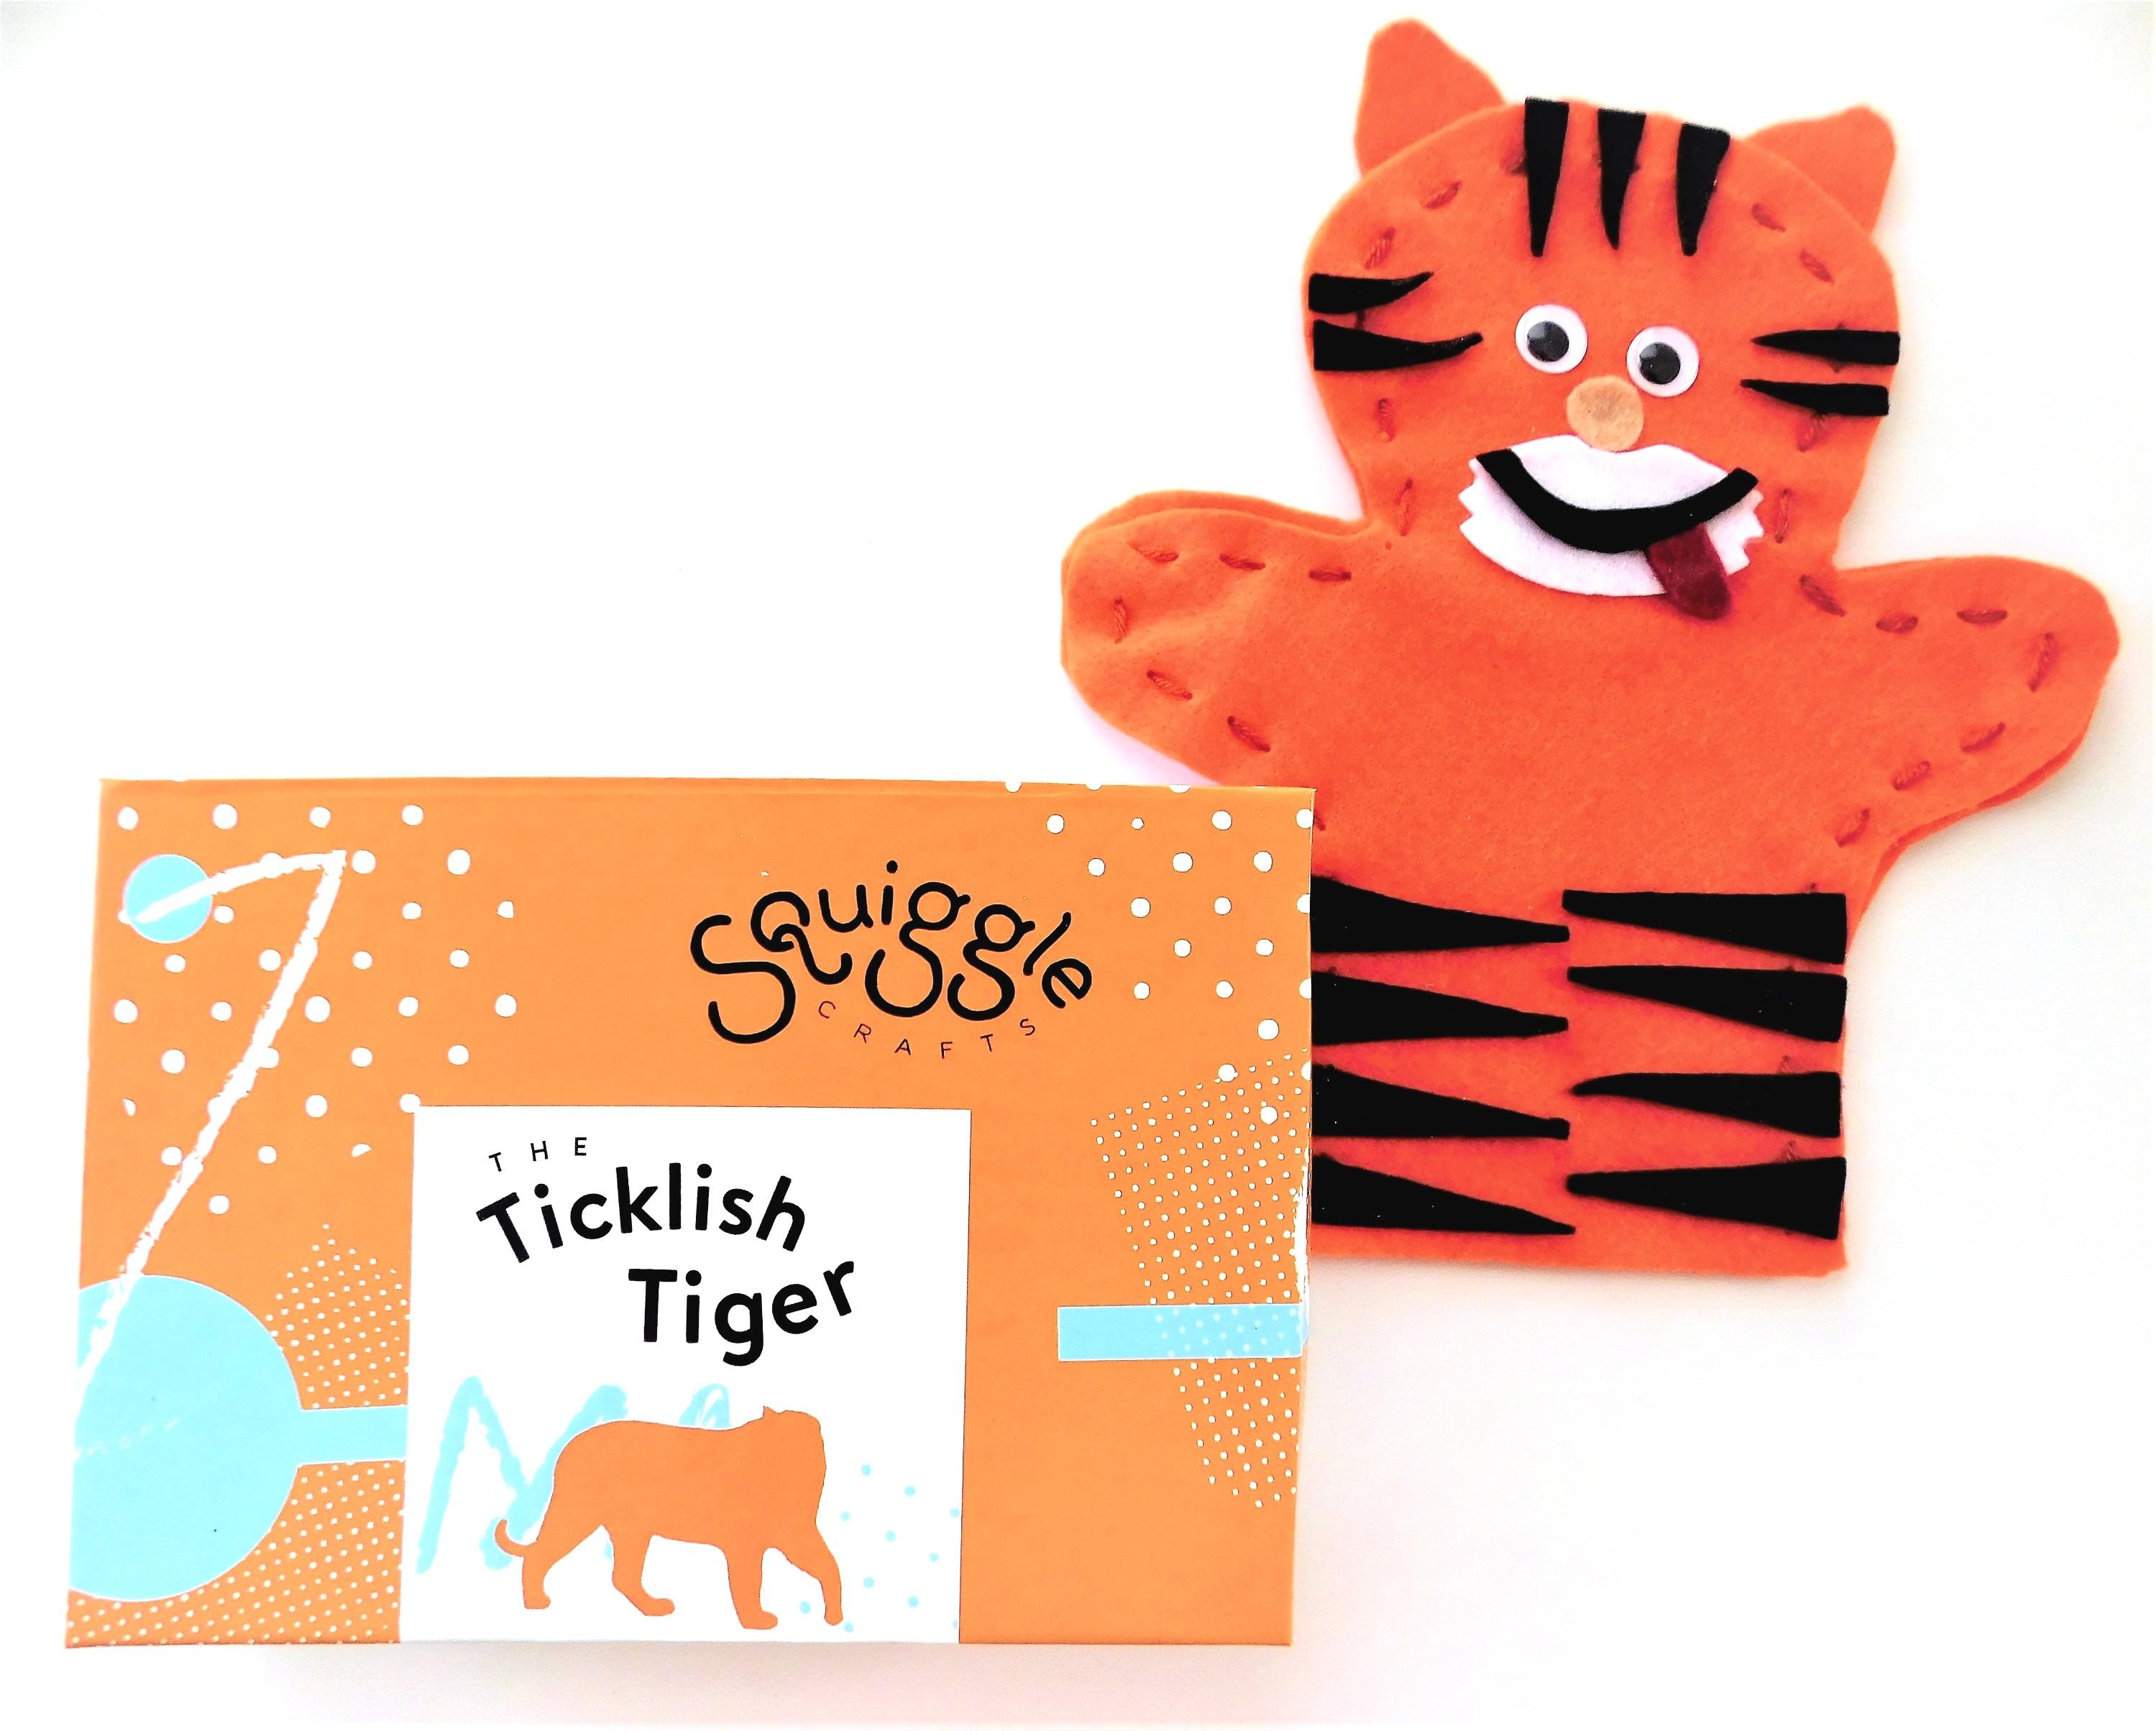 The Ticklish Tiger